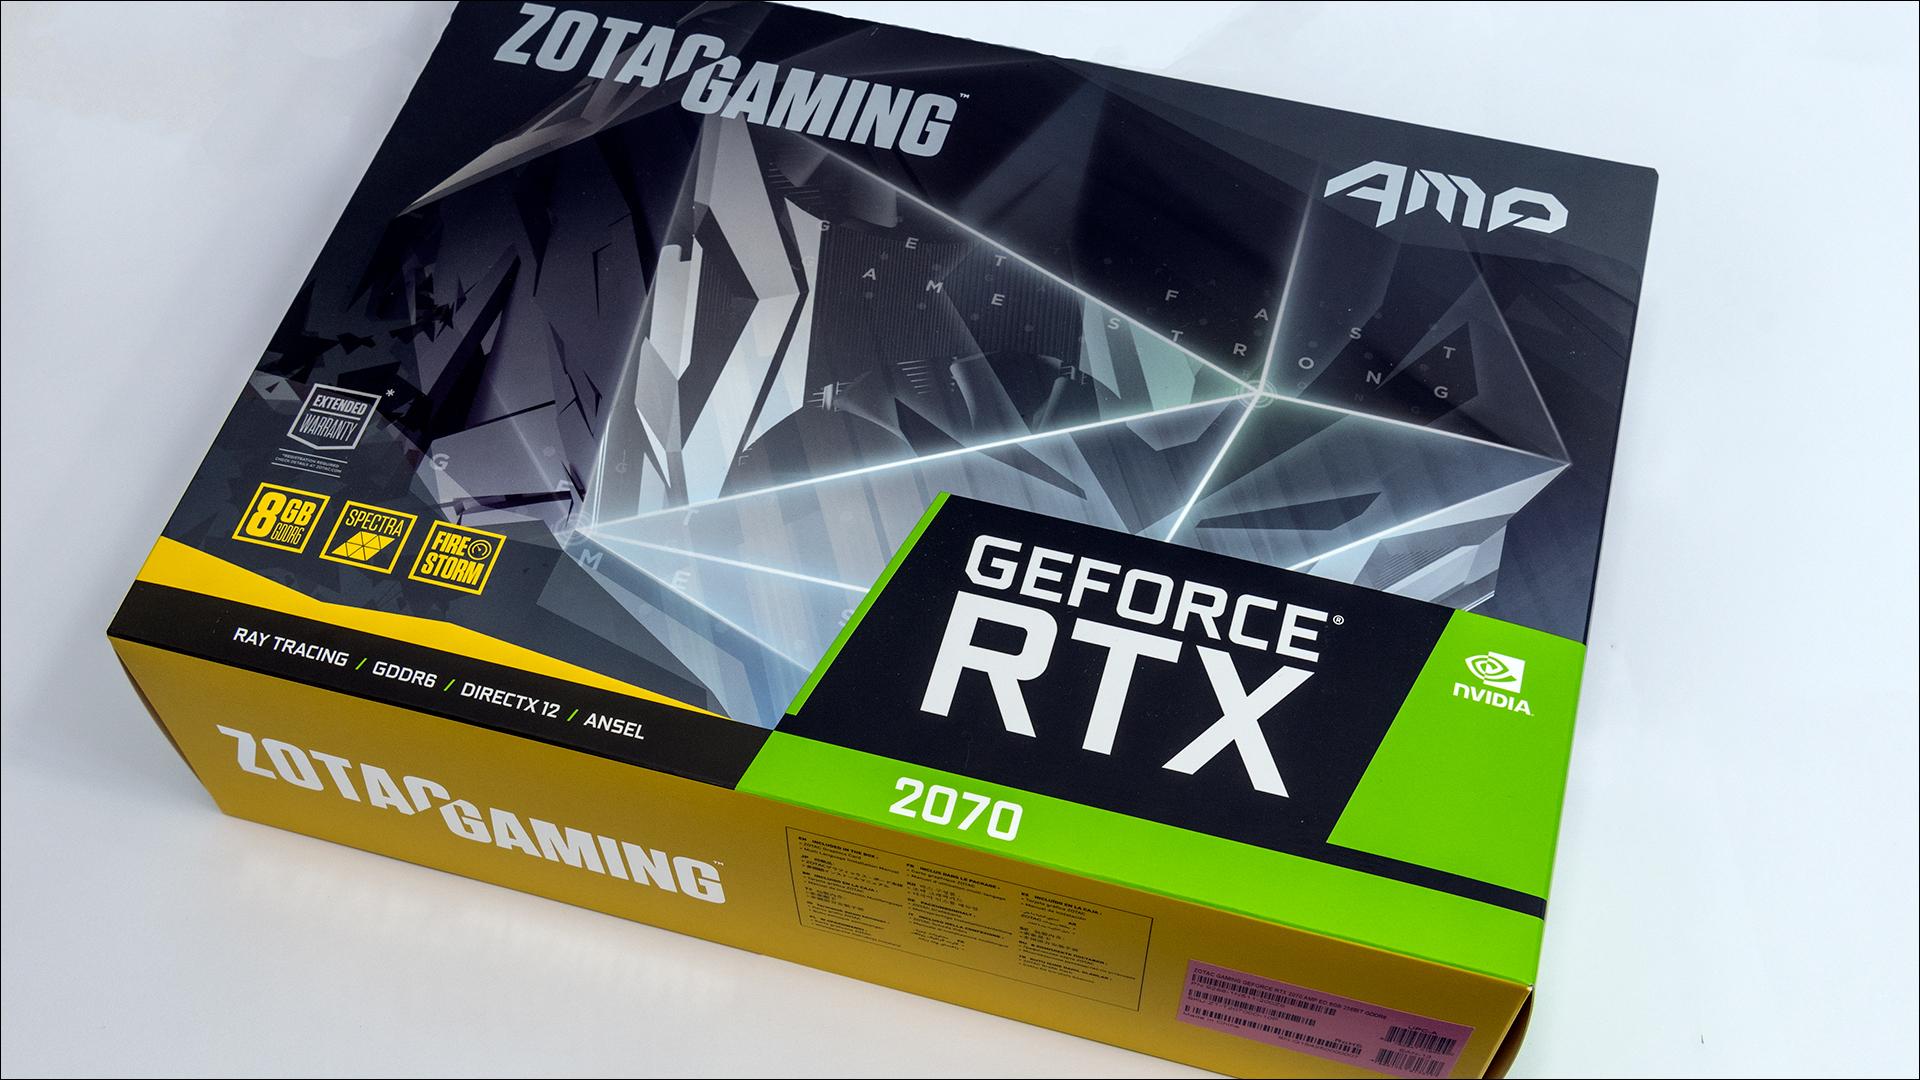 Zotac Gaming GeForce RTX 2070 AMP: Smaller design, but